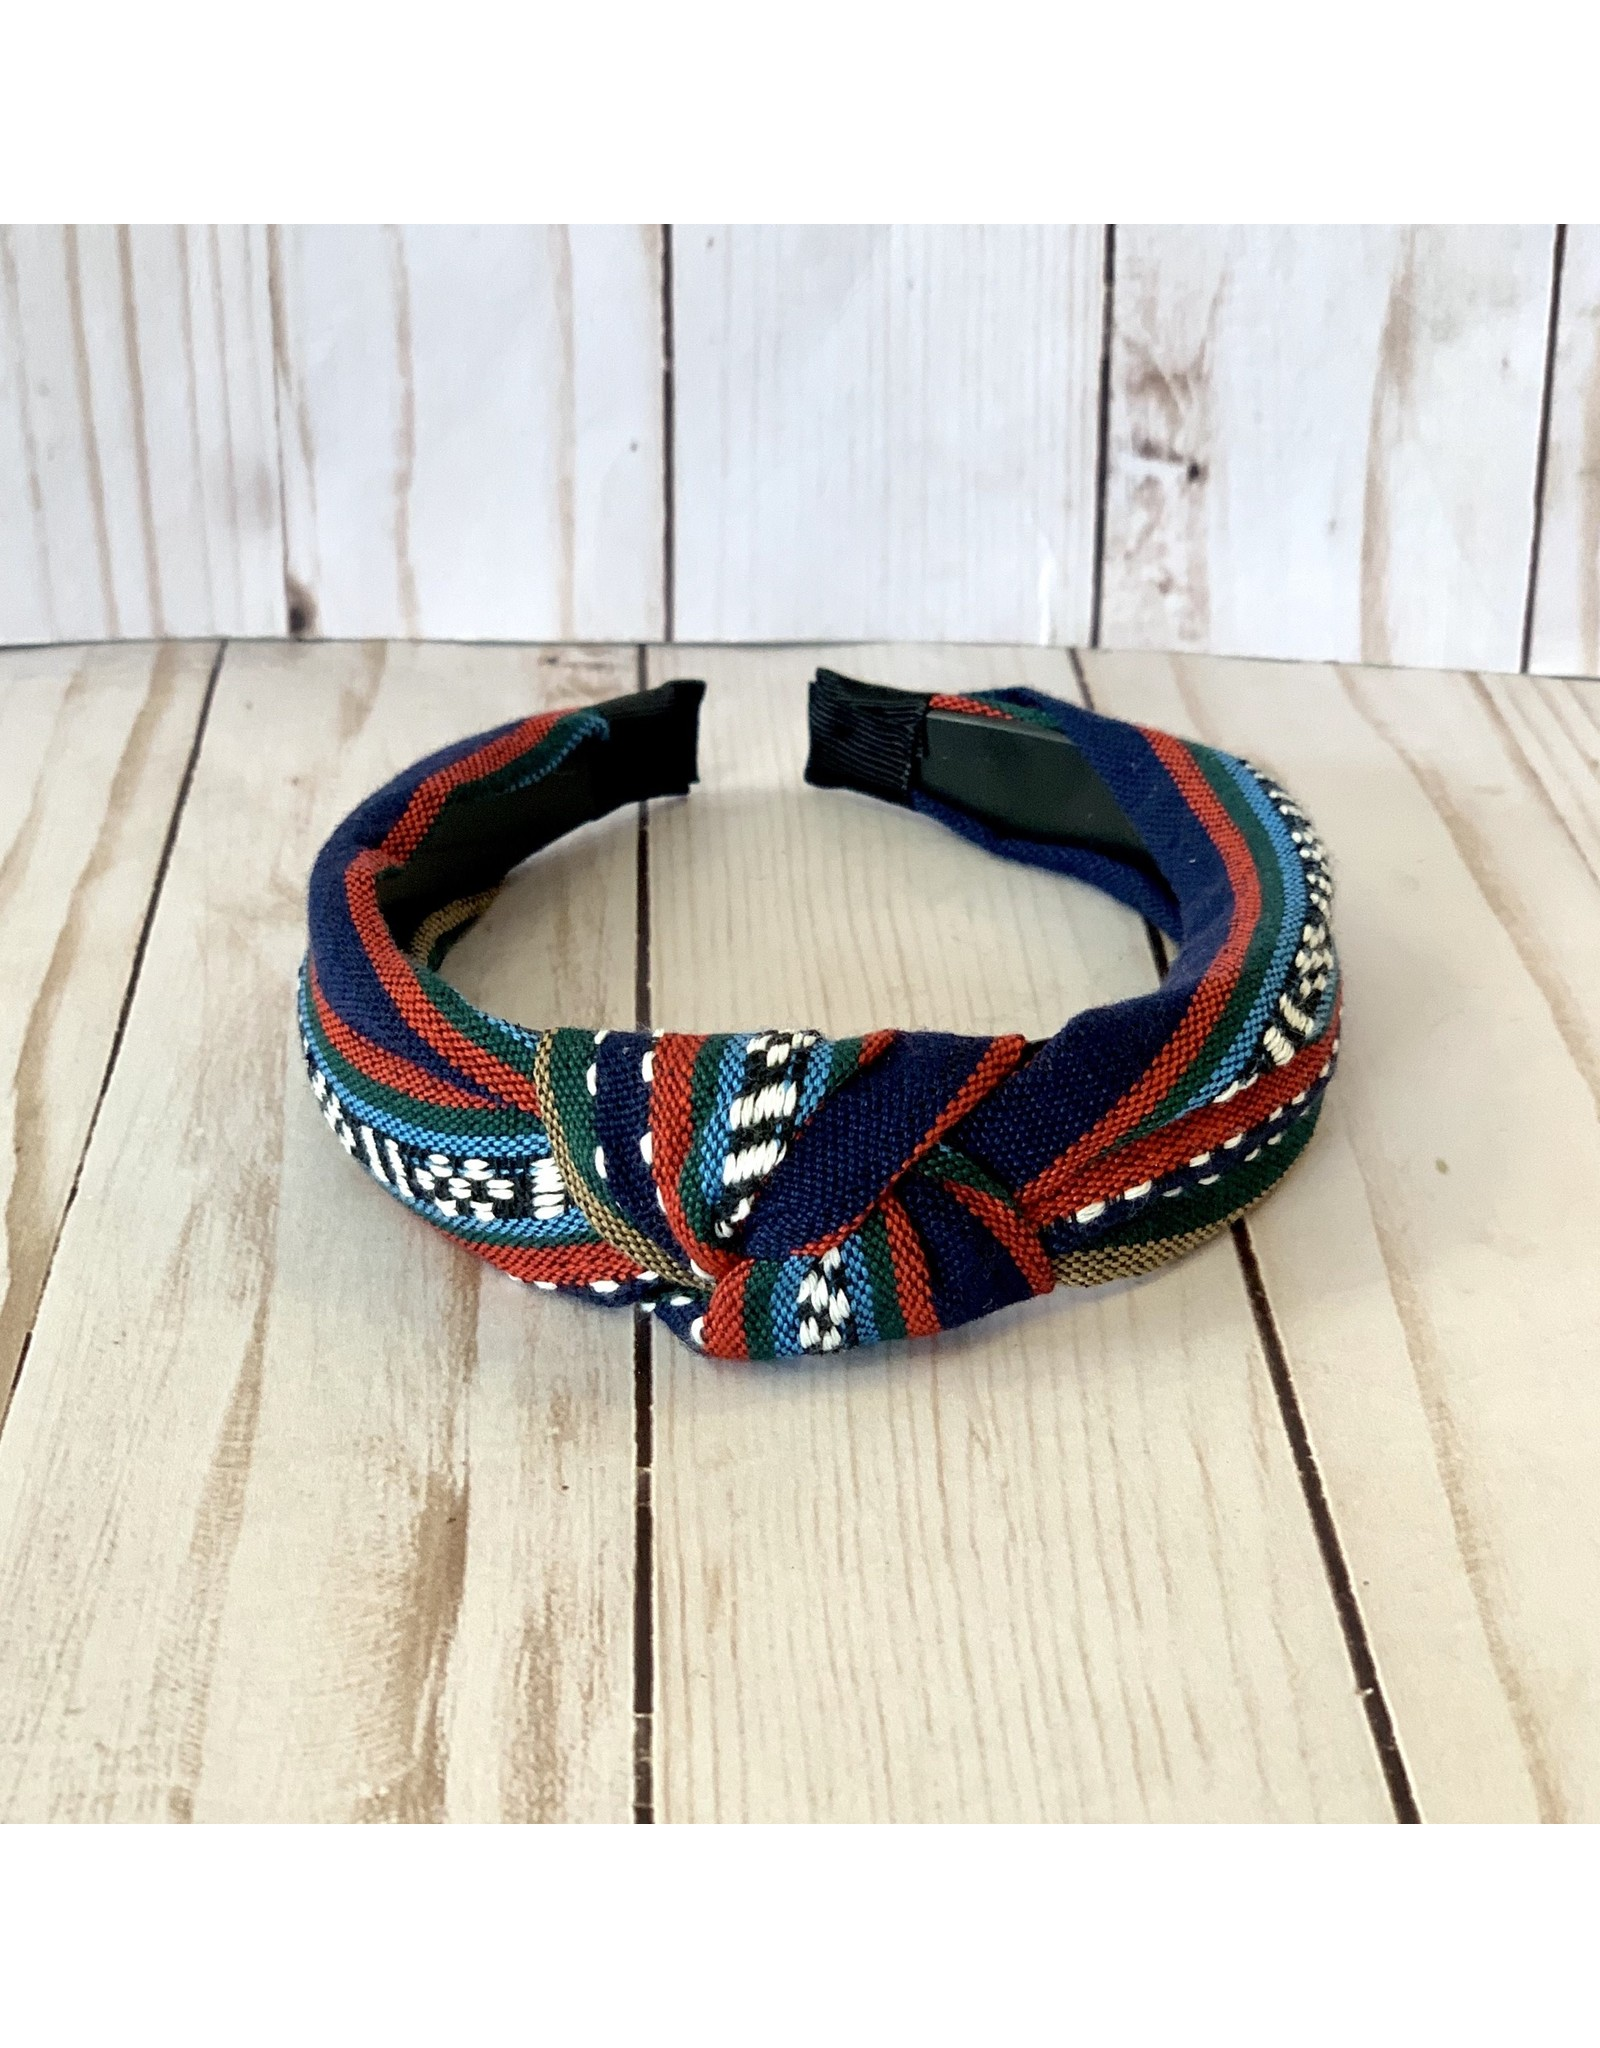 Funteze Accessories TRIBAL Knotted Headband